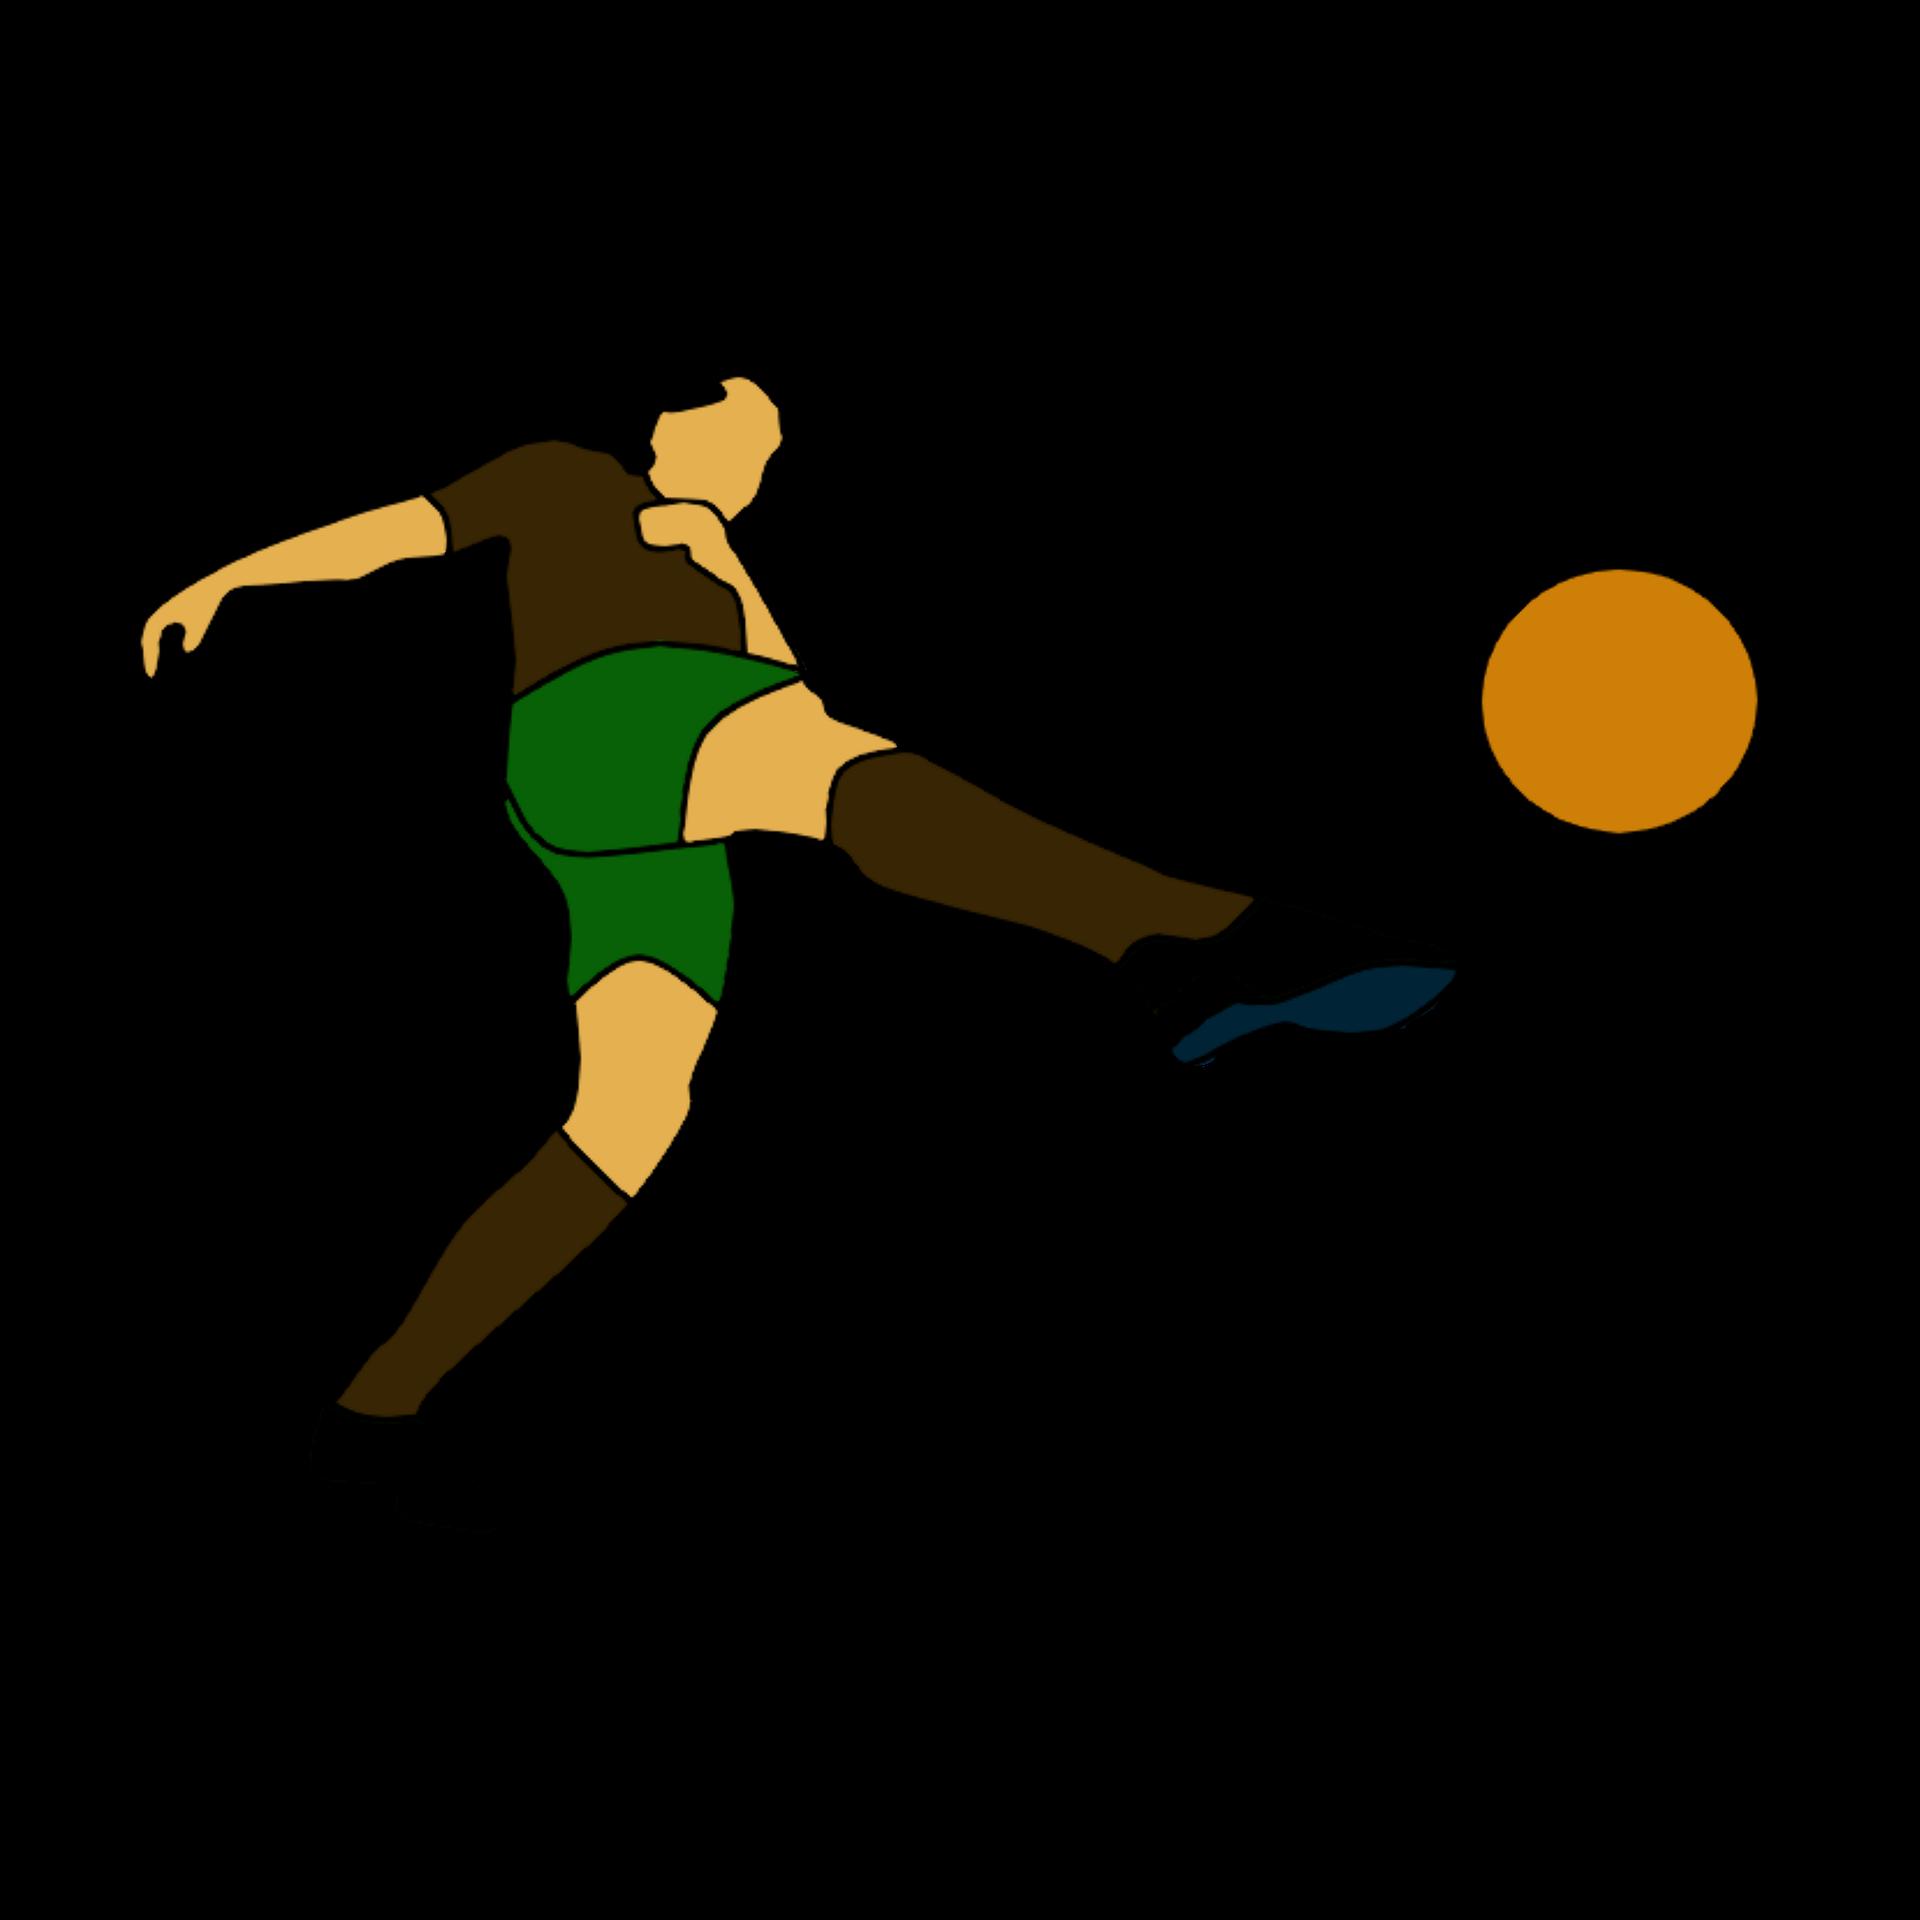 football-2658776_1920